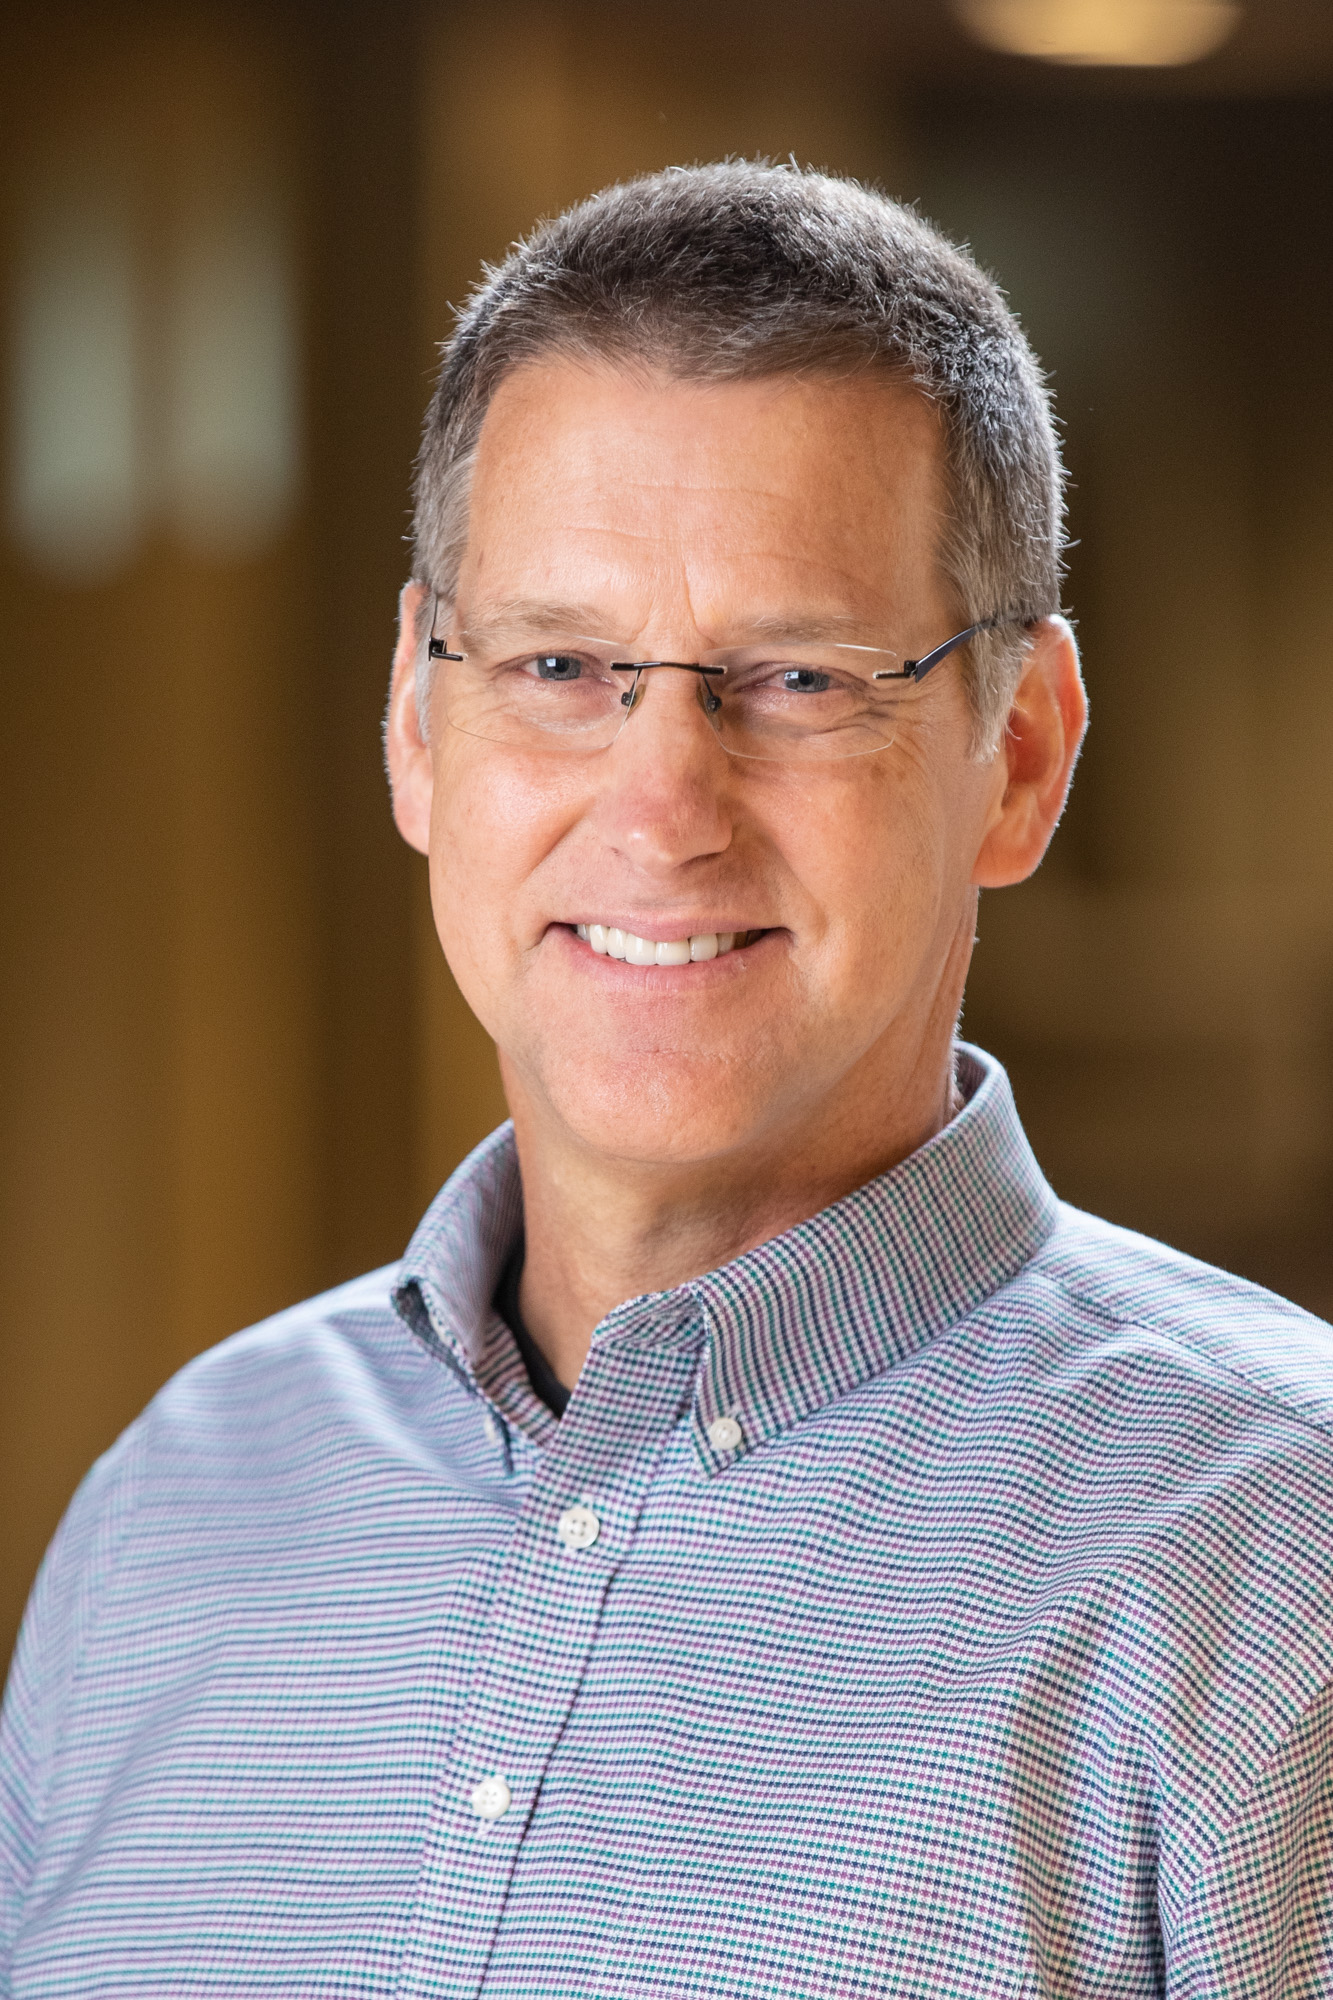 Jeff Lawson